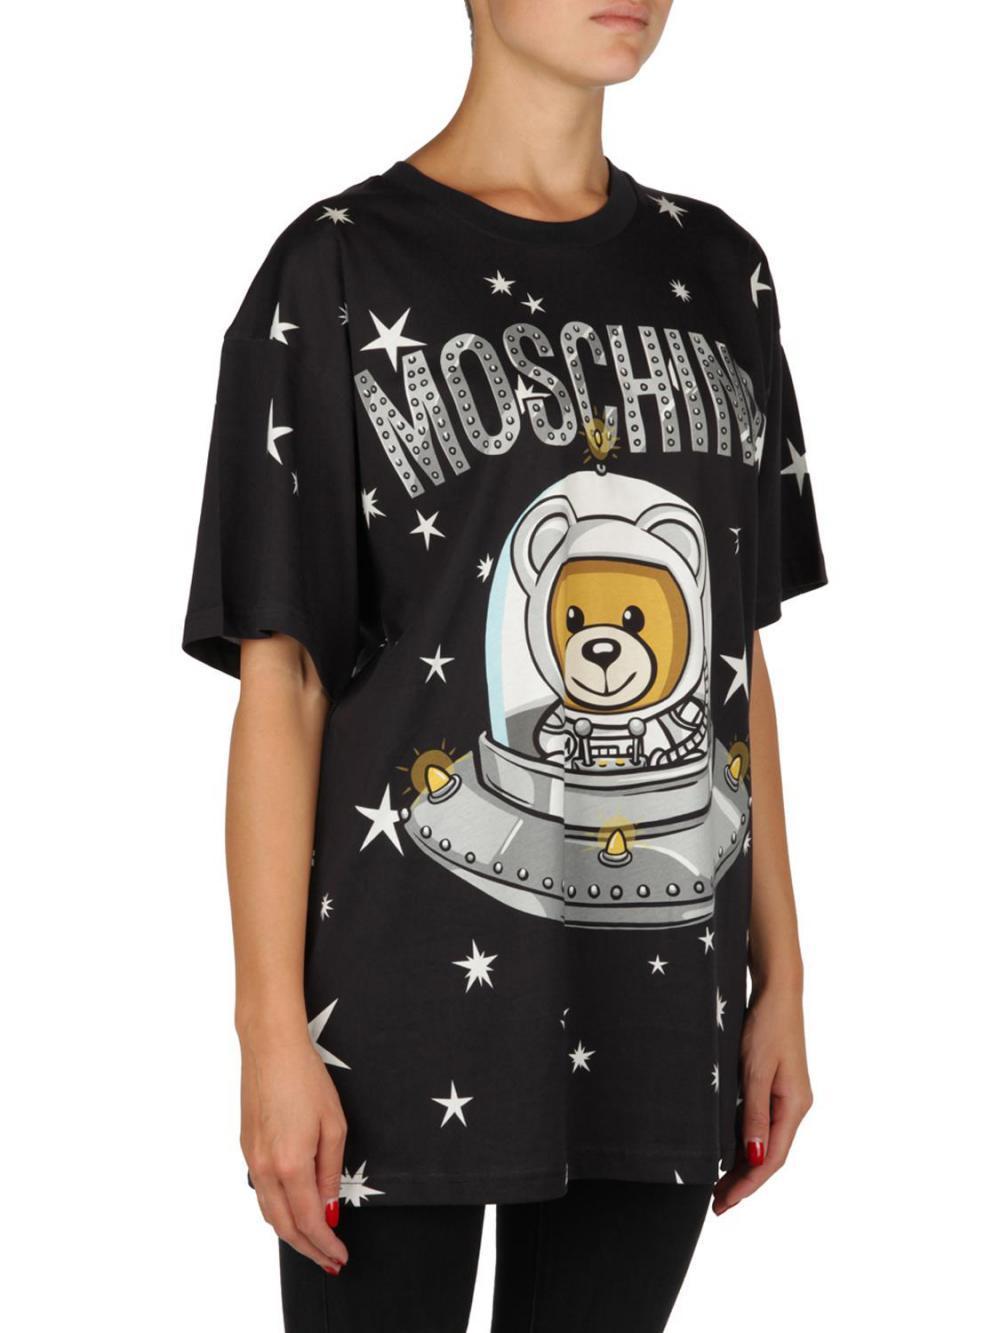 t-shirt-moschino-in-cotone-donna-moschino-cod-v0703